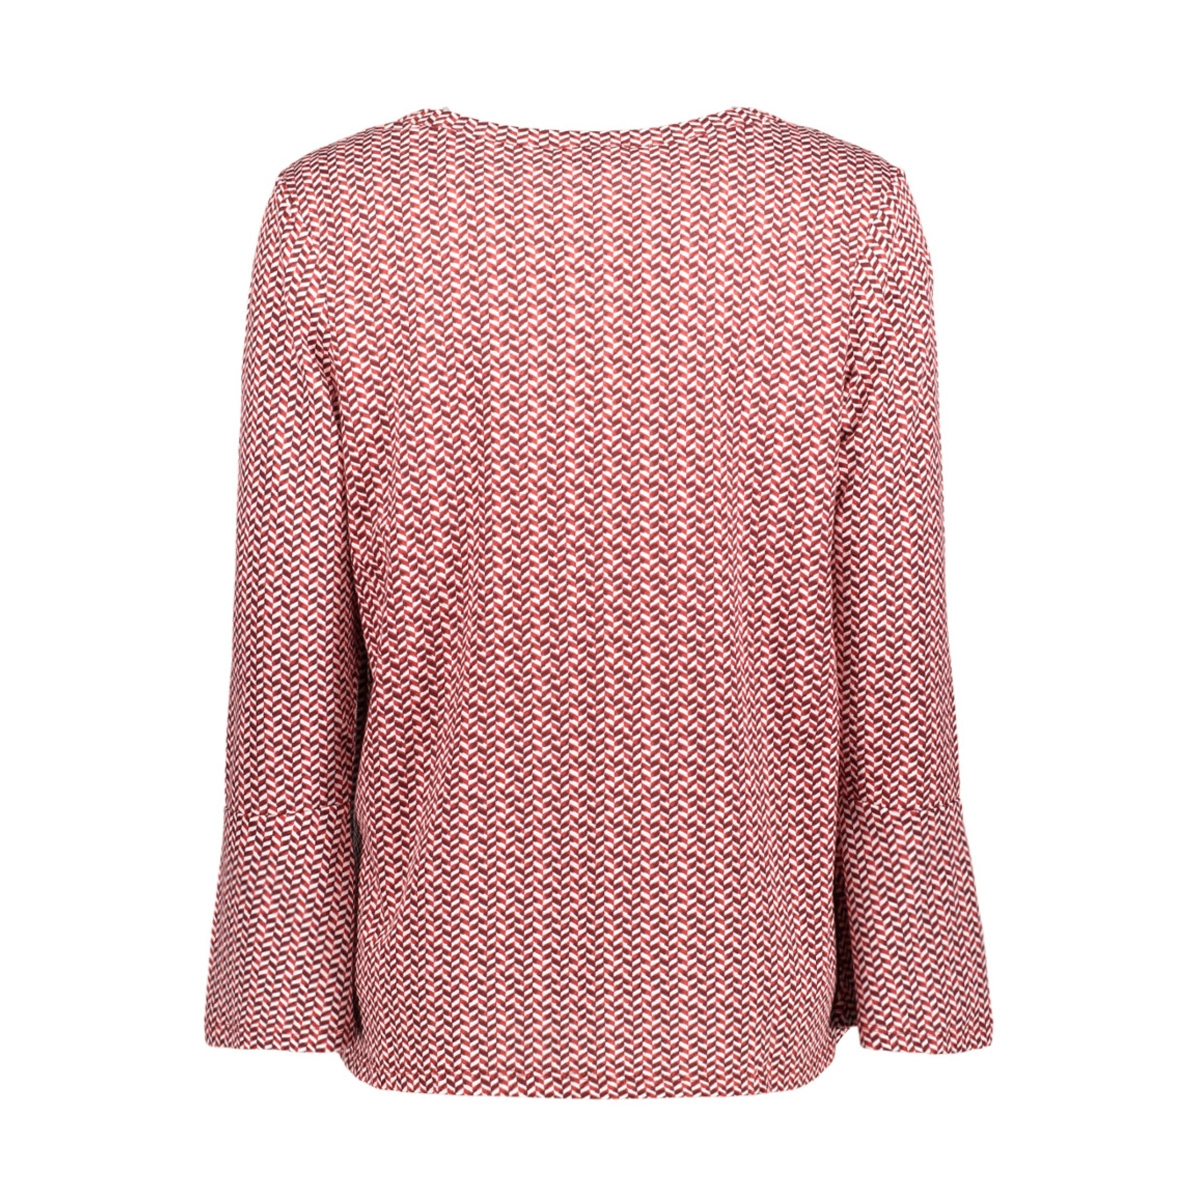 1038854.00.70 tom tailor t-shirt 4663